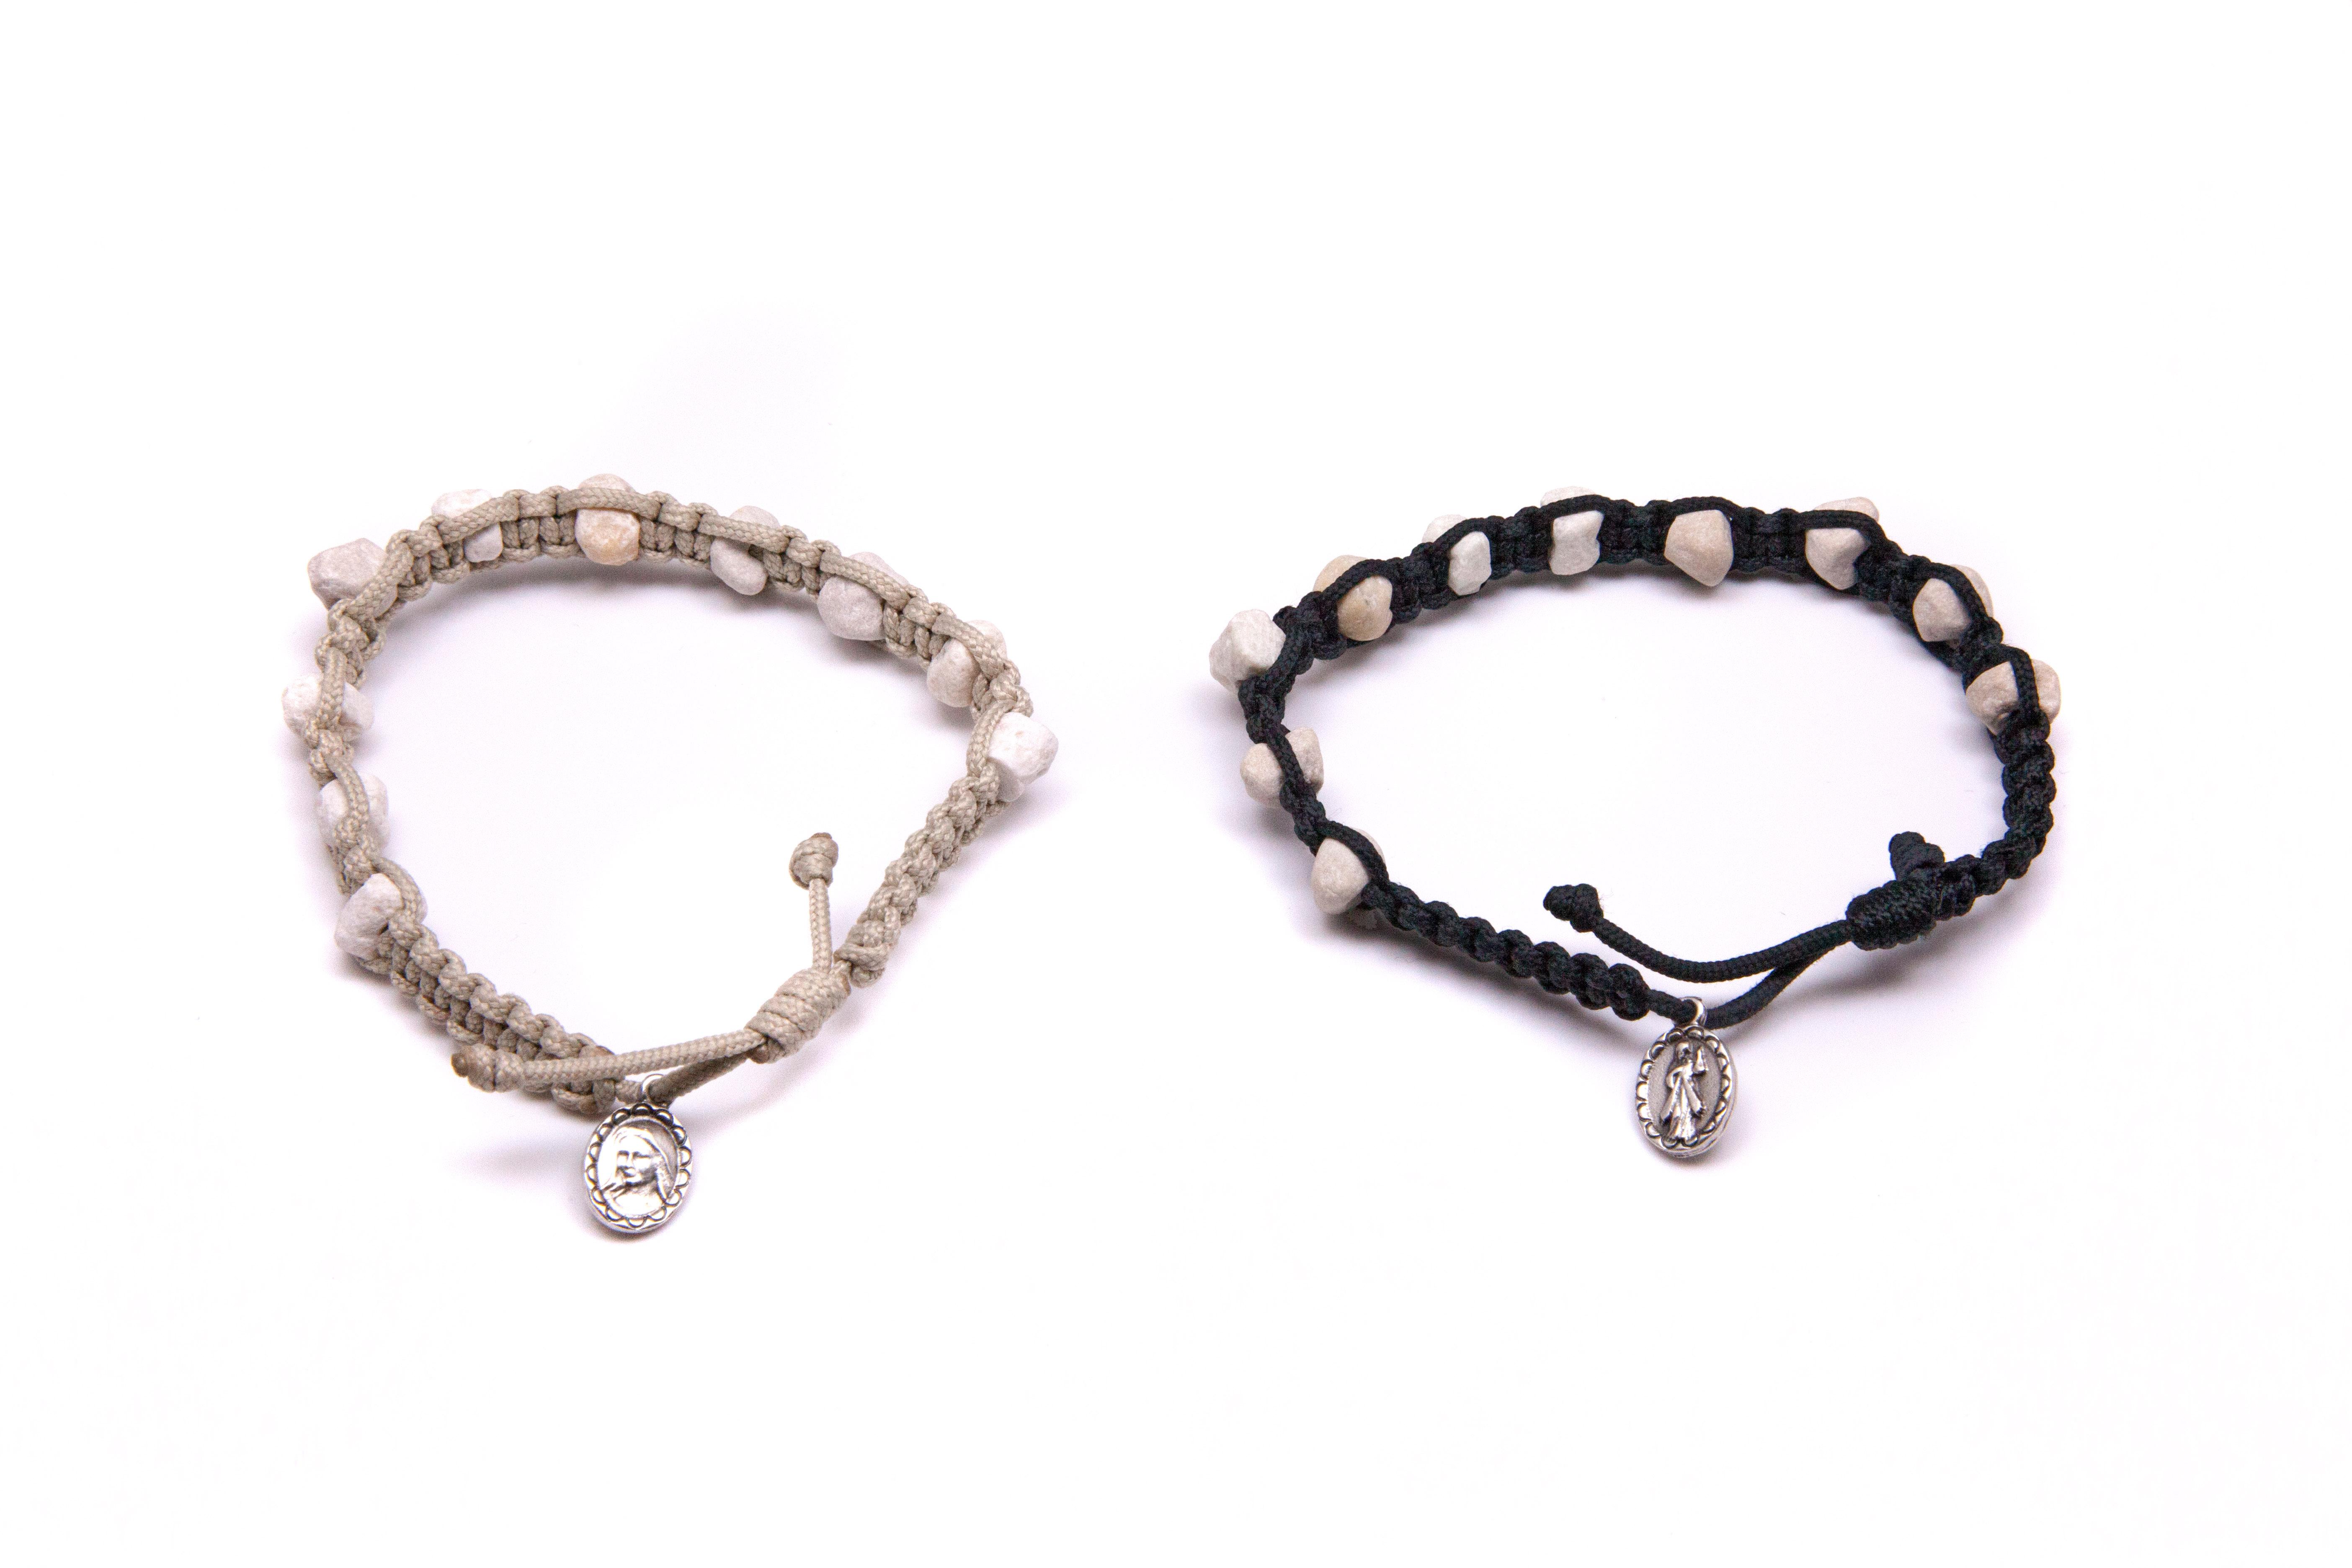 Medjugorje Stone Rosary Bracelet